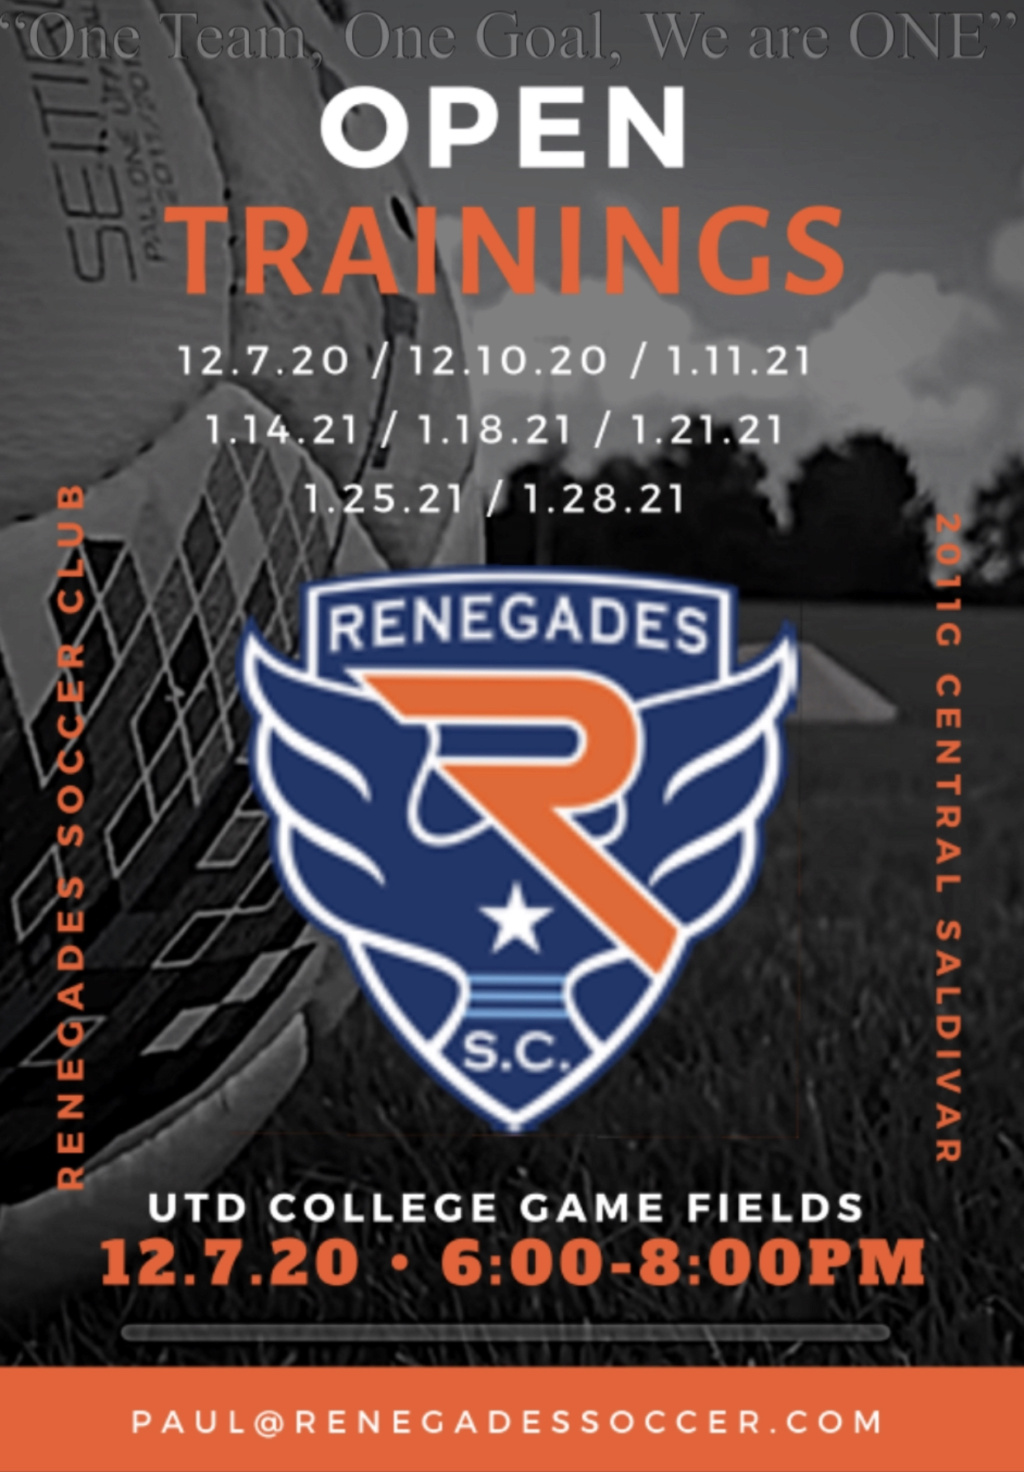 Renegades 2011G team forming 2020/2021 3b08ec10